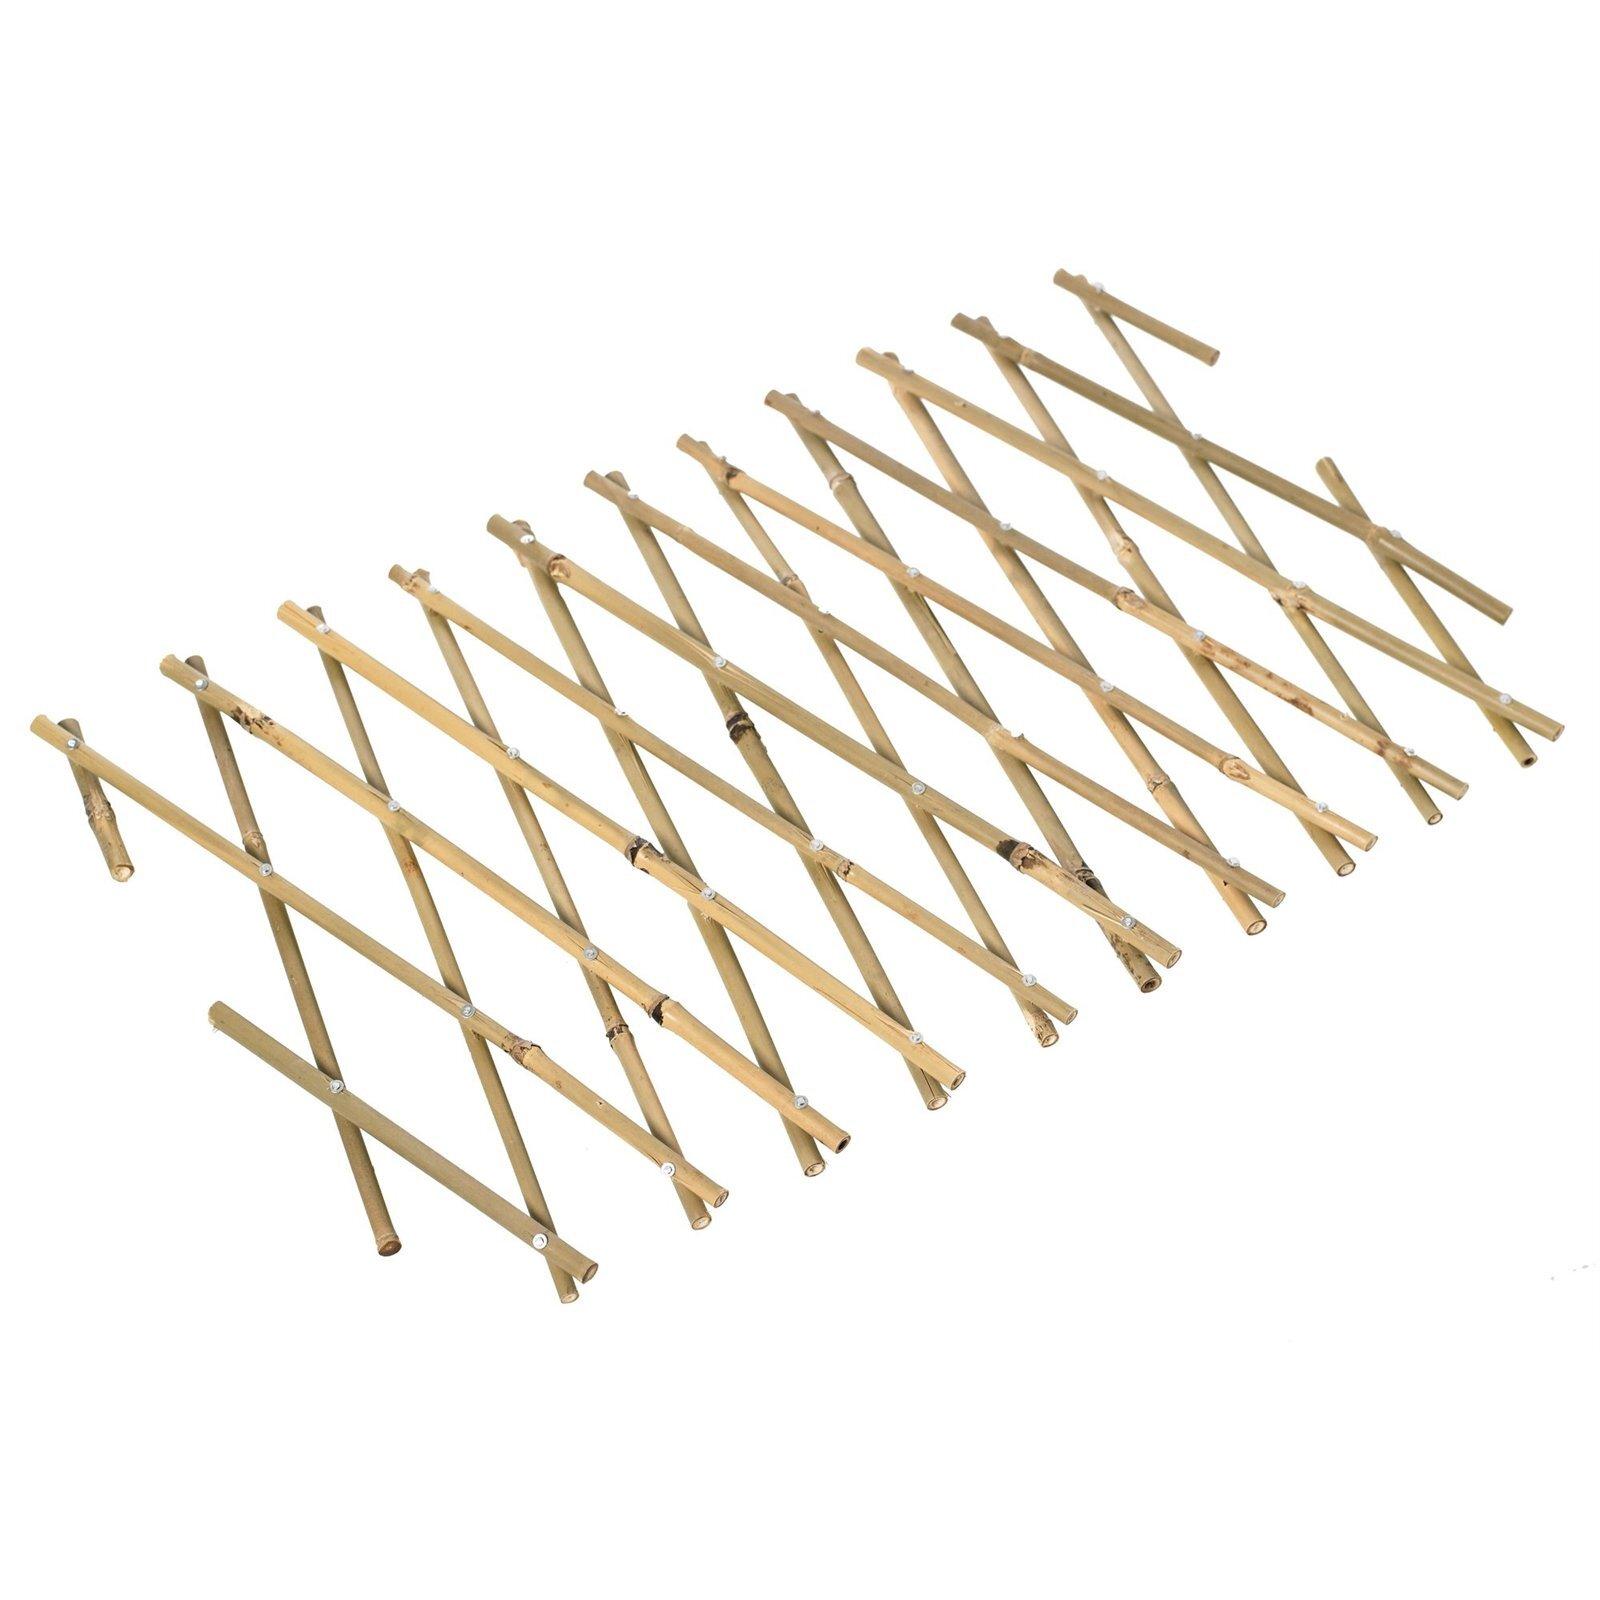 Lattice Makers 1800 x 900mm Bamboo Expanding Trellis